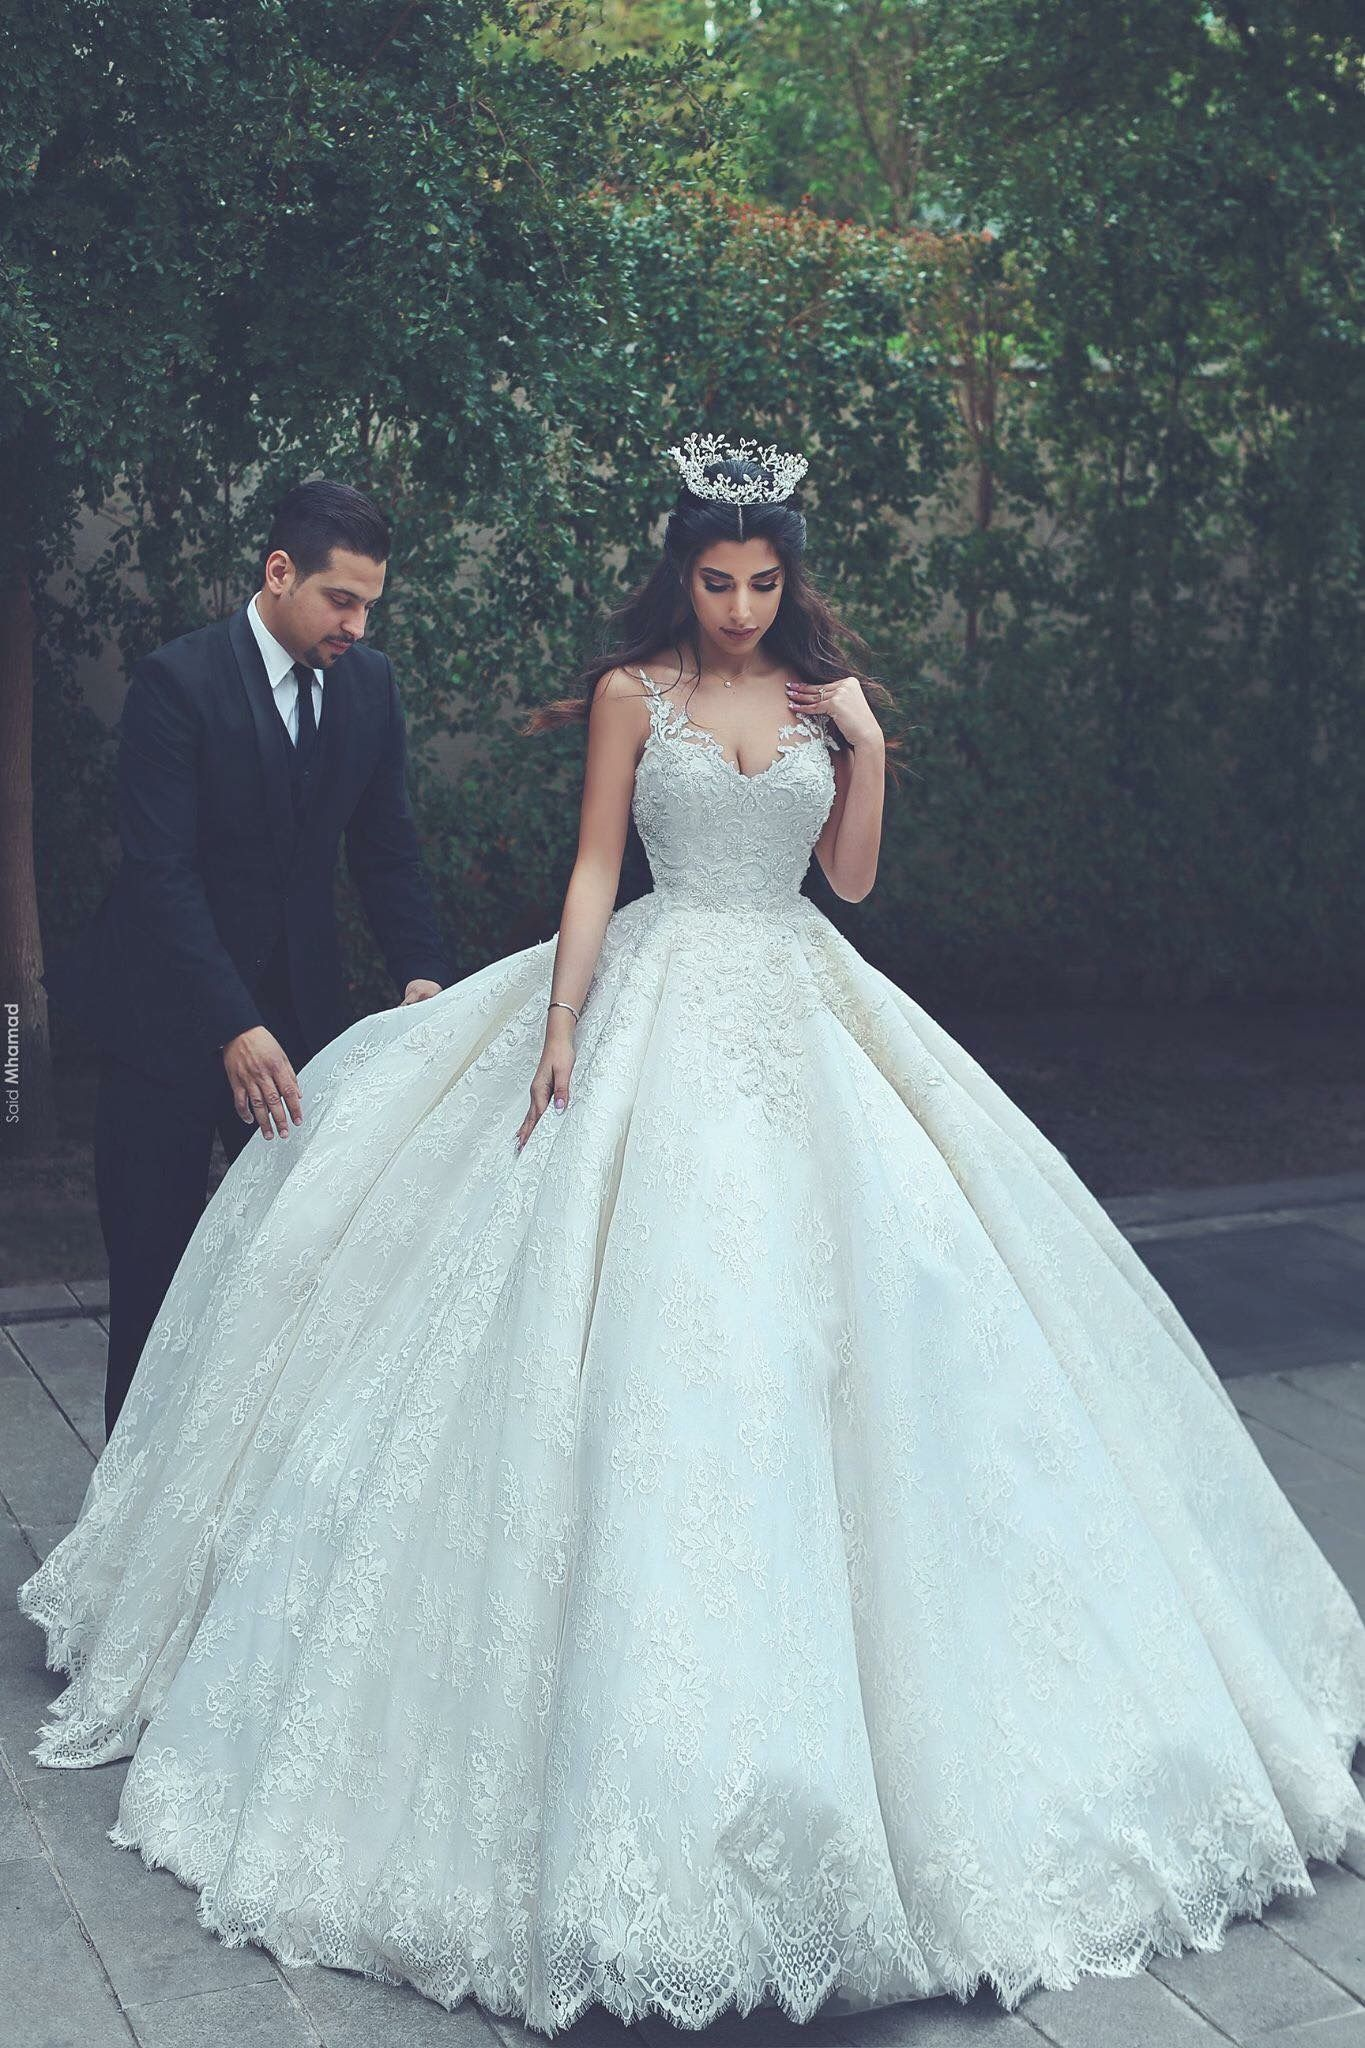 instagram - saminashortyali ♡ pinterest - @SaminaAli1992 | Wedding ...